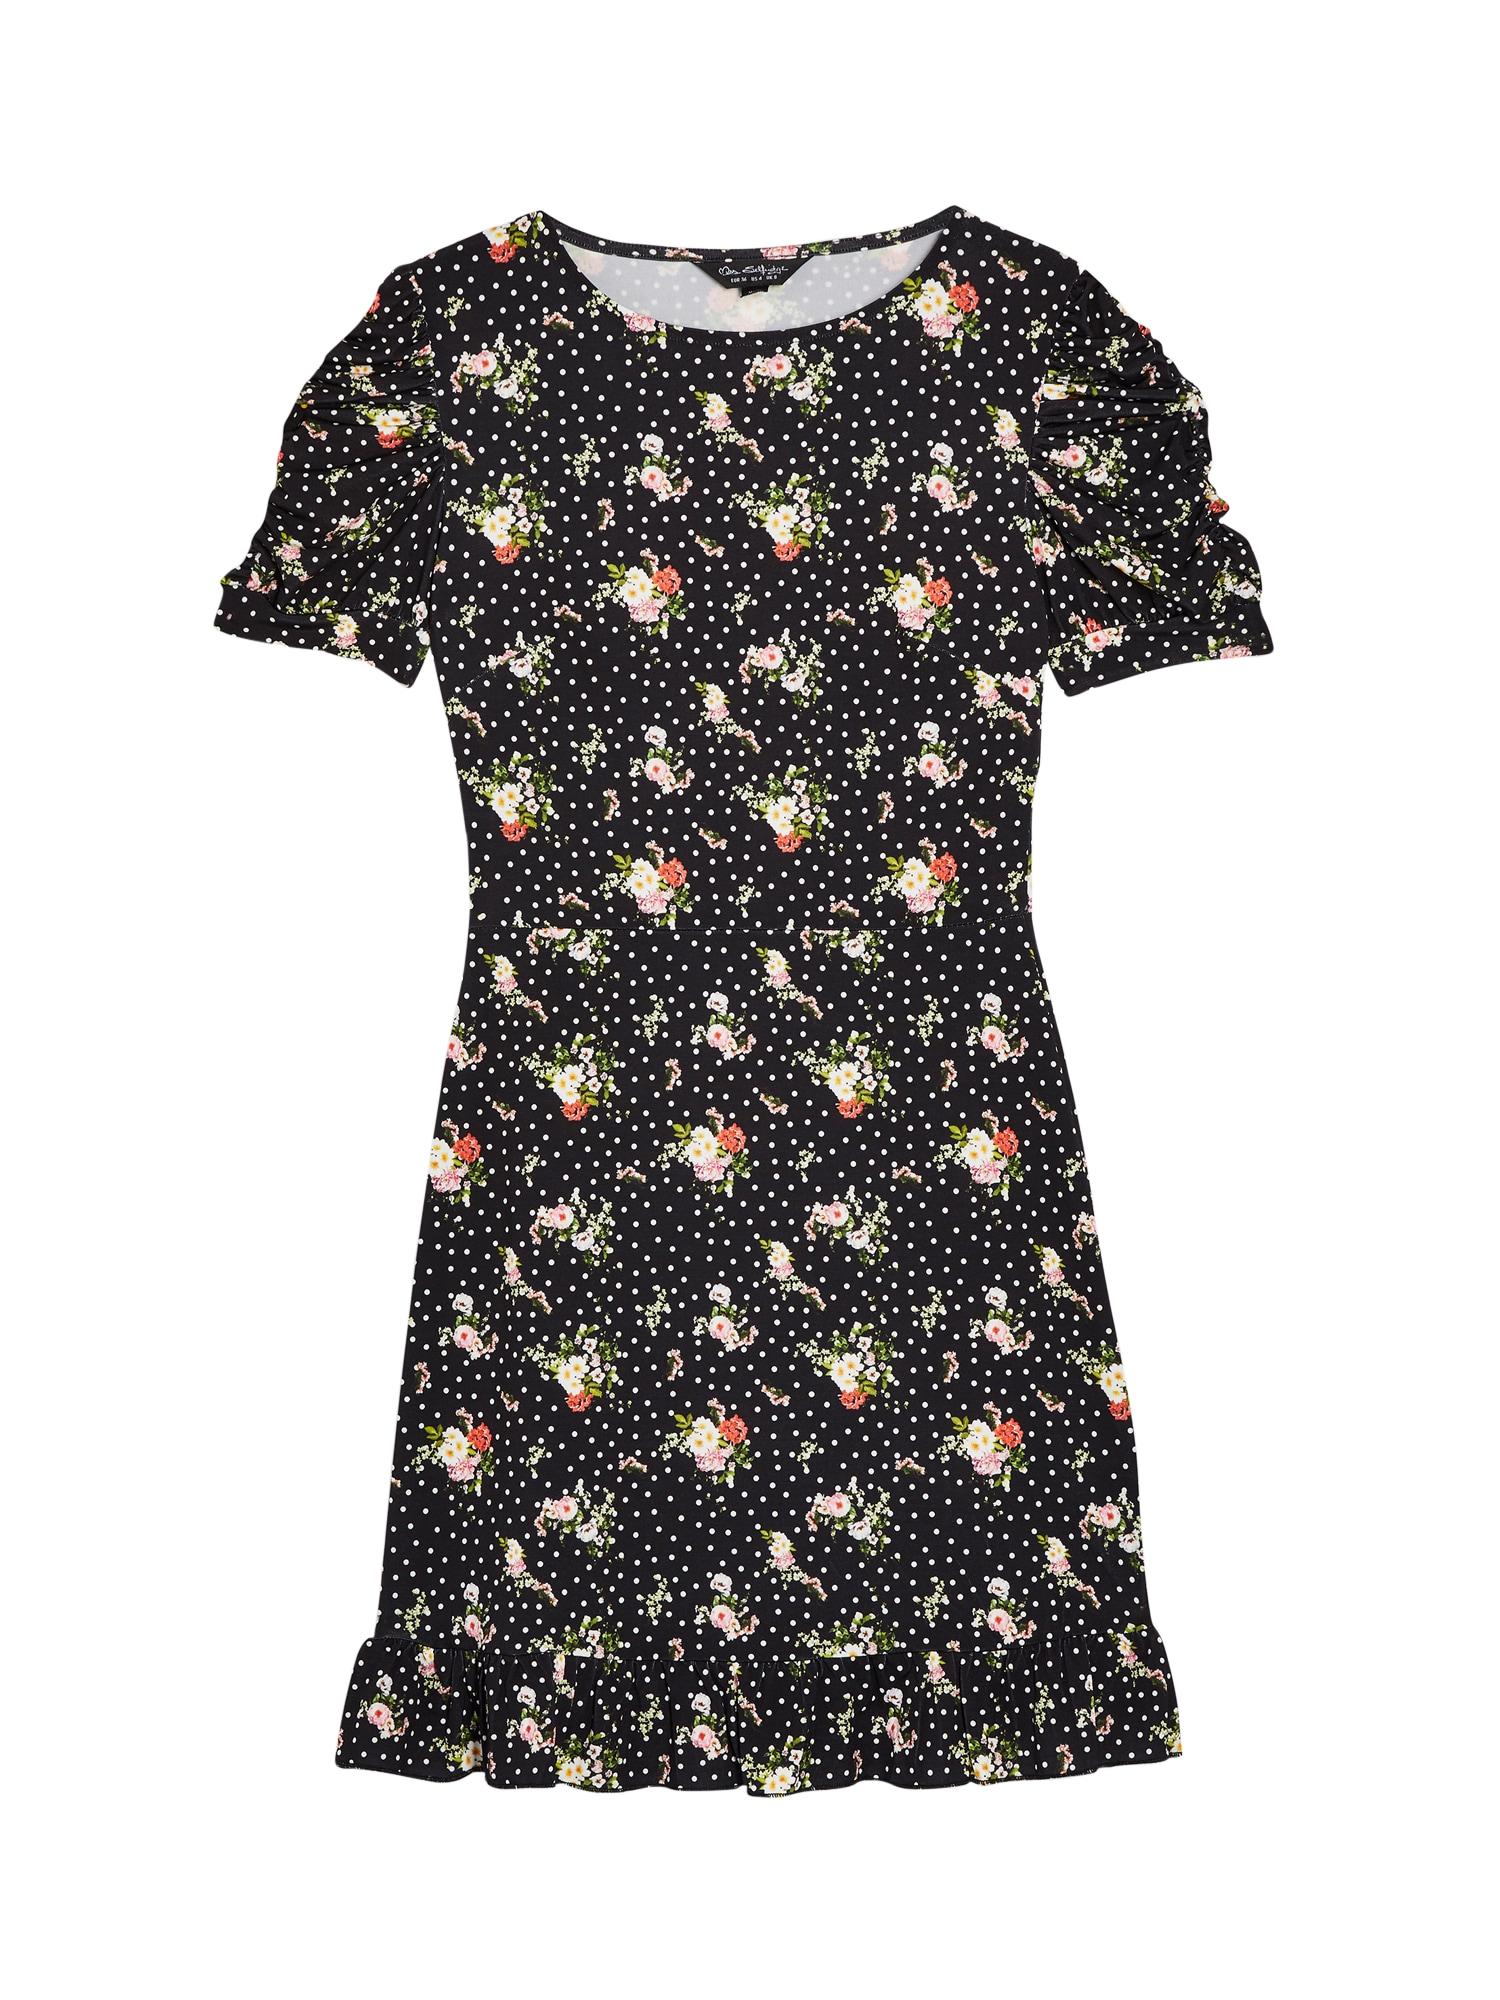 Miss Selfridge Rochie 'PUFF SLEEVE DRESS'  culori mixte / negru